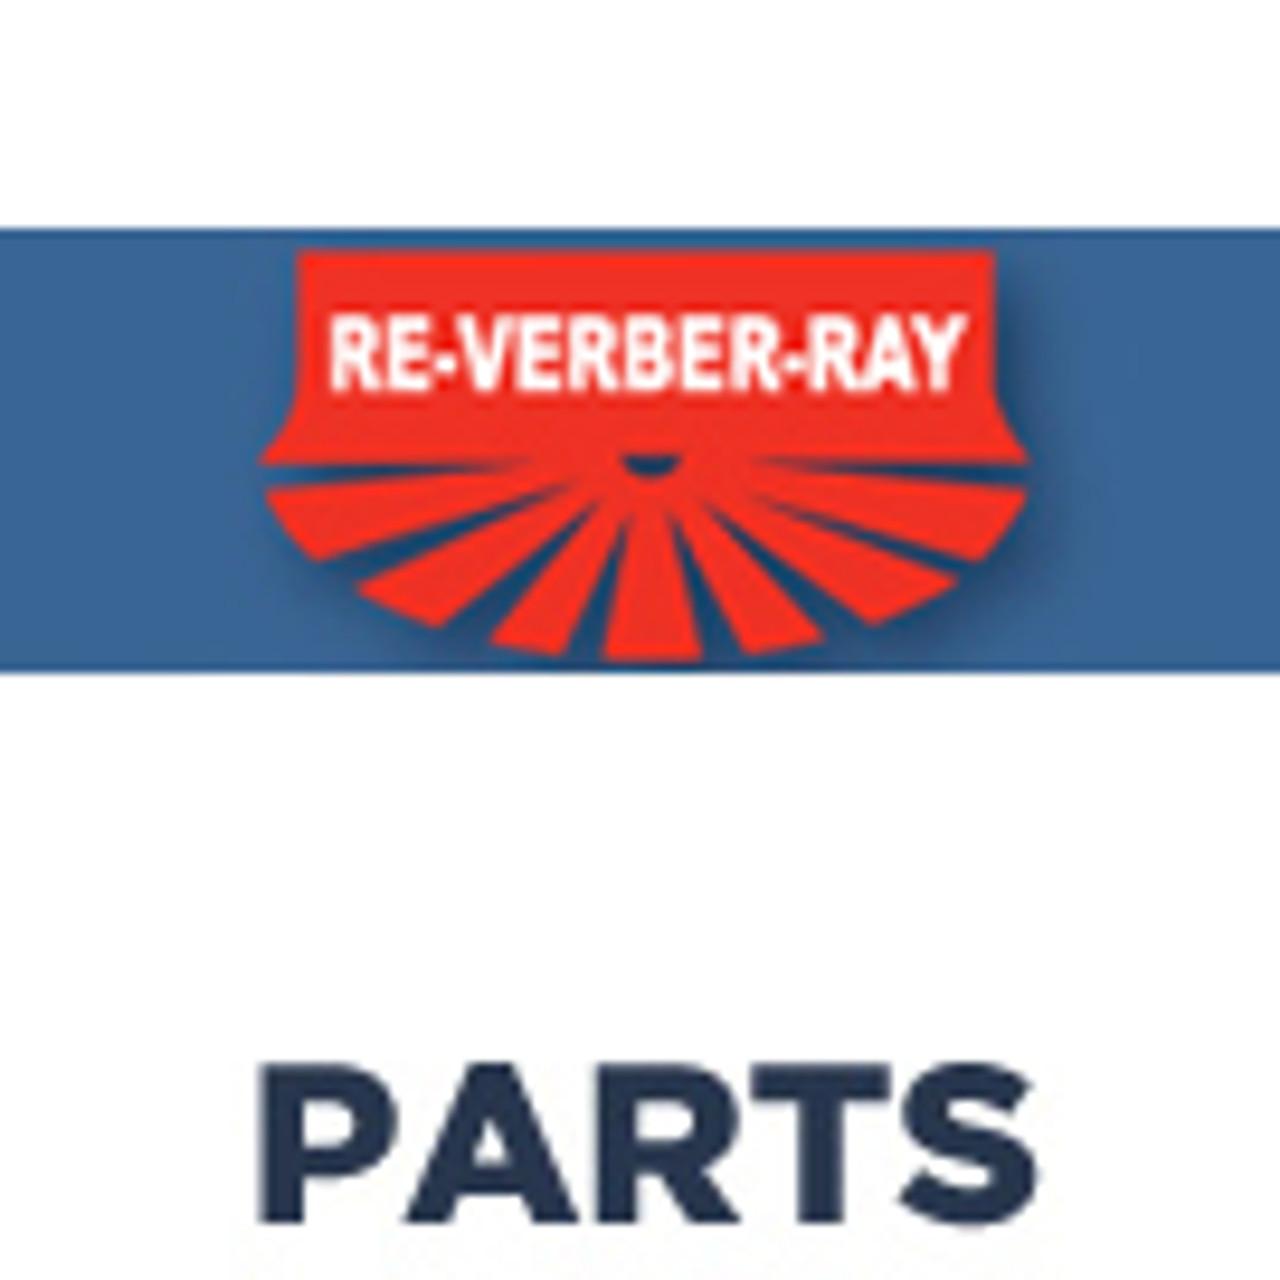 Re-Verber-Ray Parts